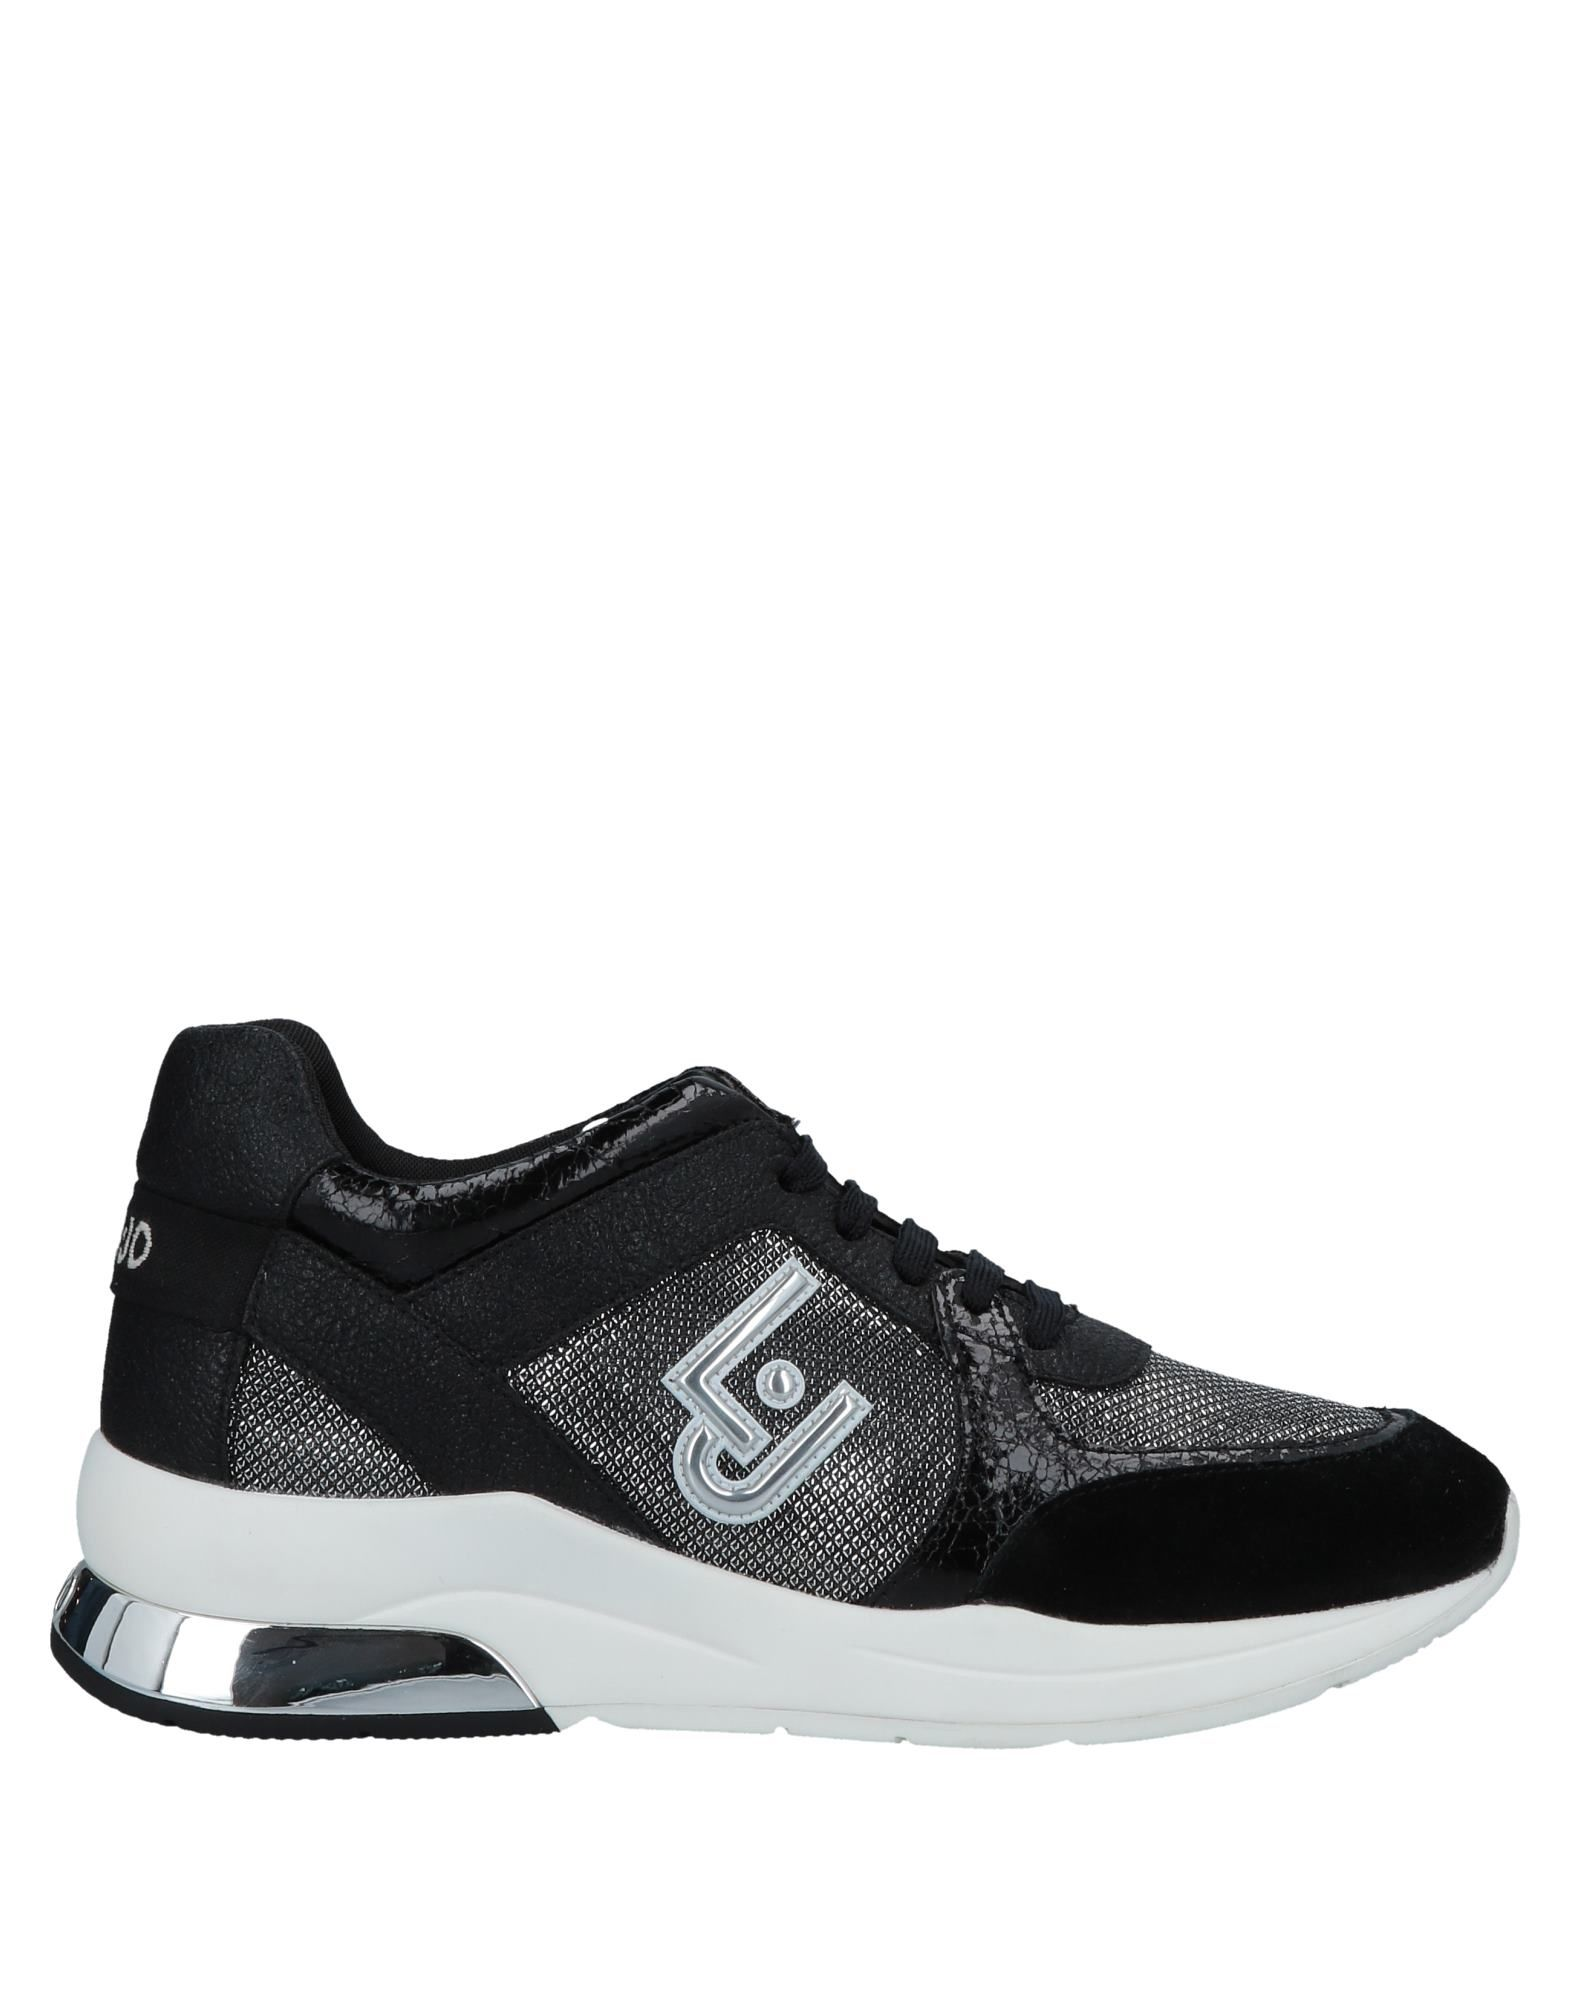 LIU •JO Низкие кеды и кроссовки кеды liu jo кеды низкие